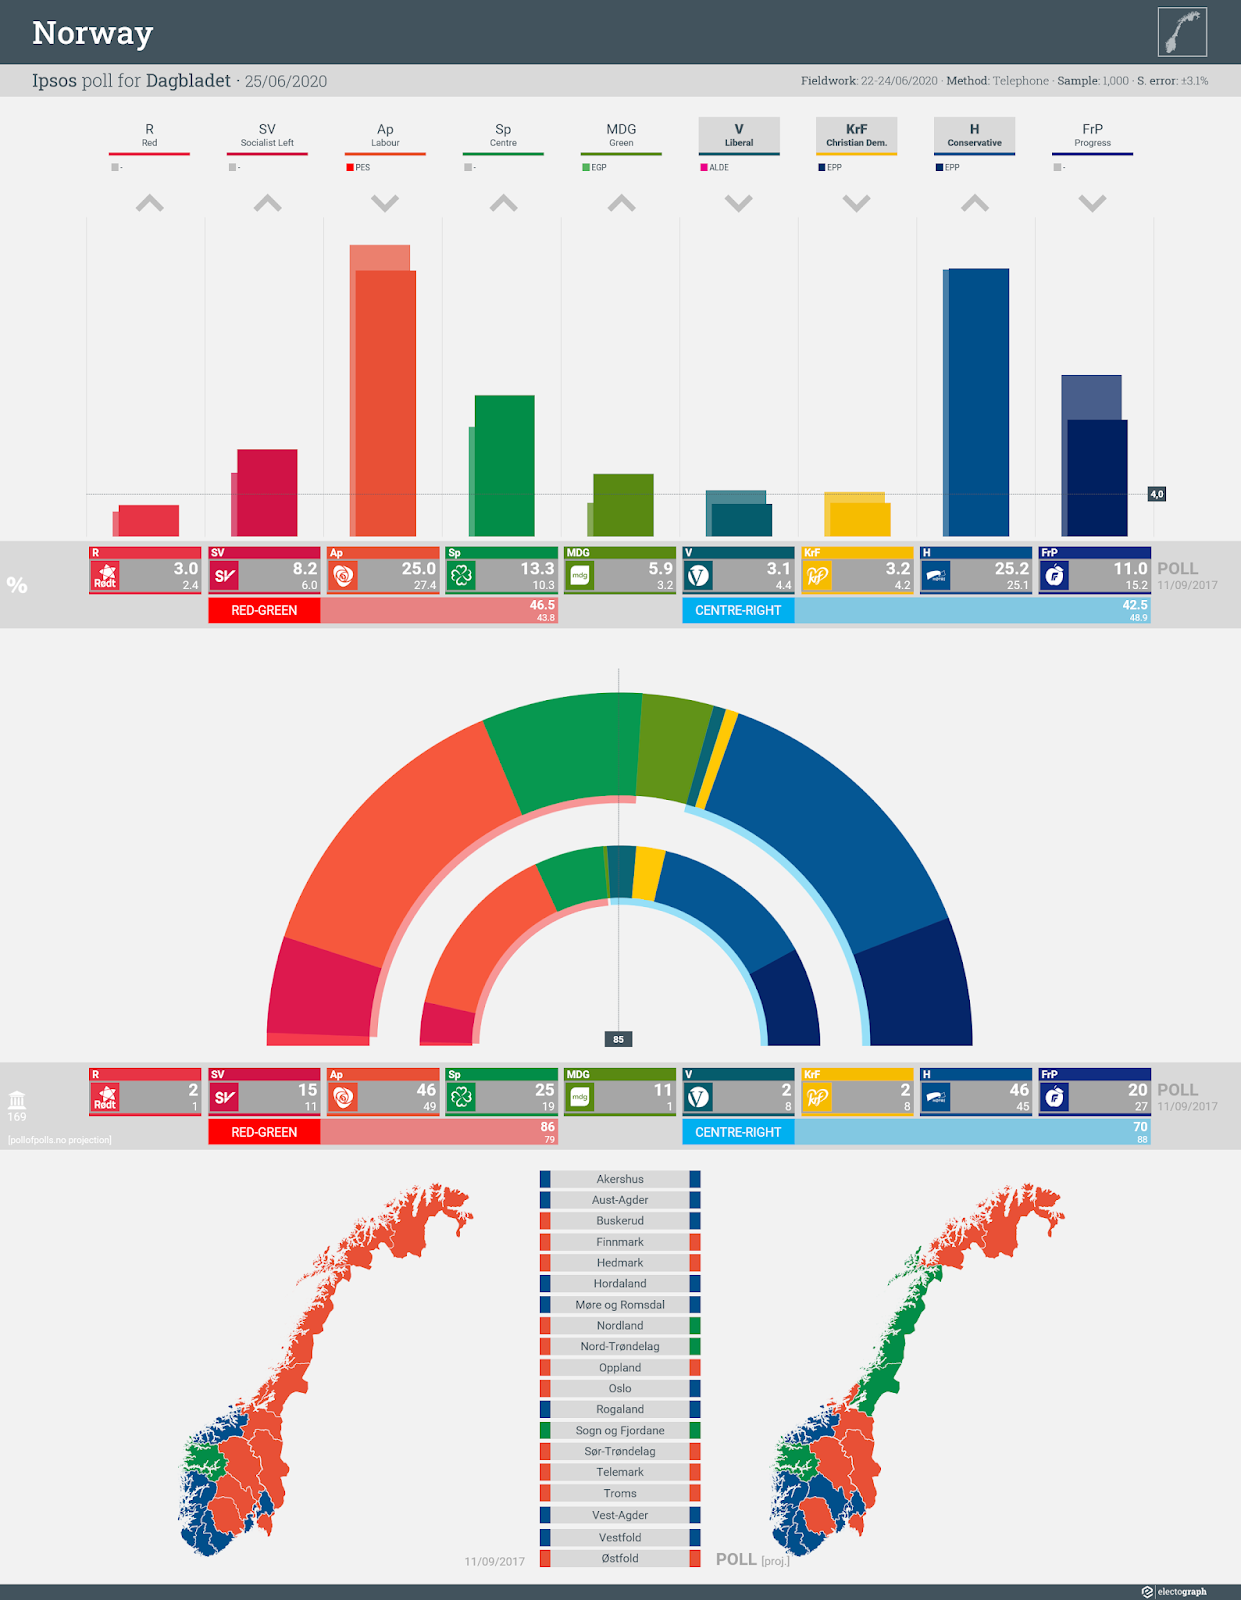 NORWAY: Ipsos poll chart for Dagbladet, 25 June 2020